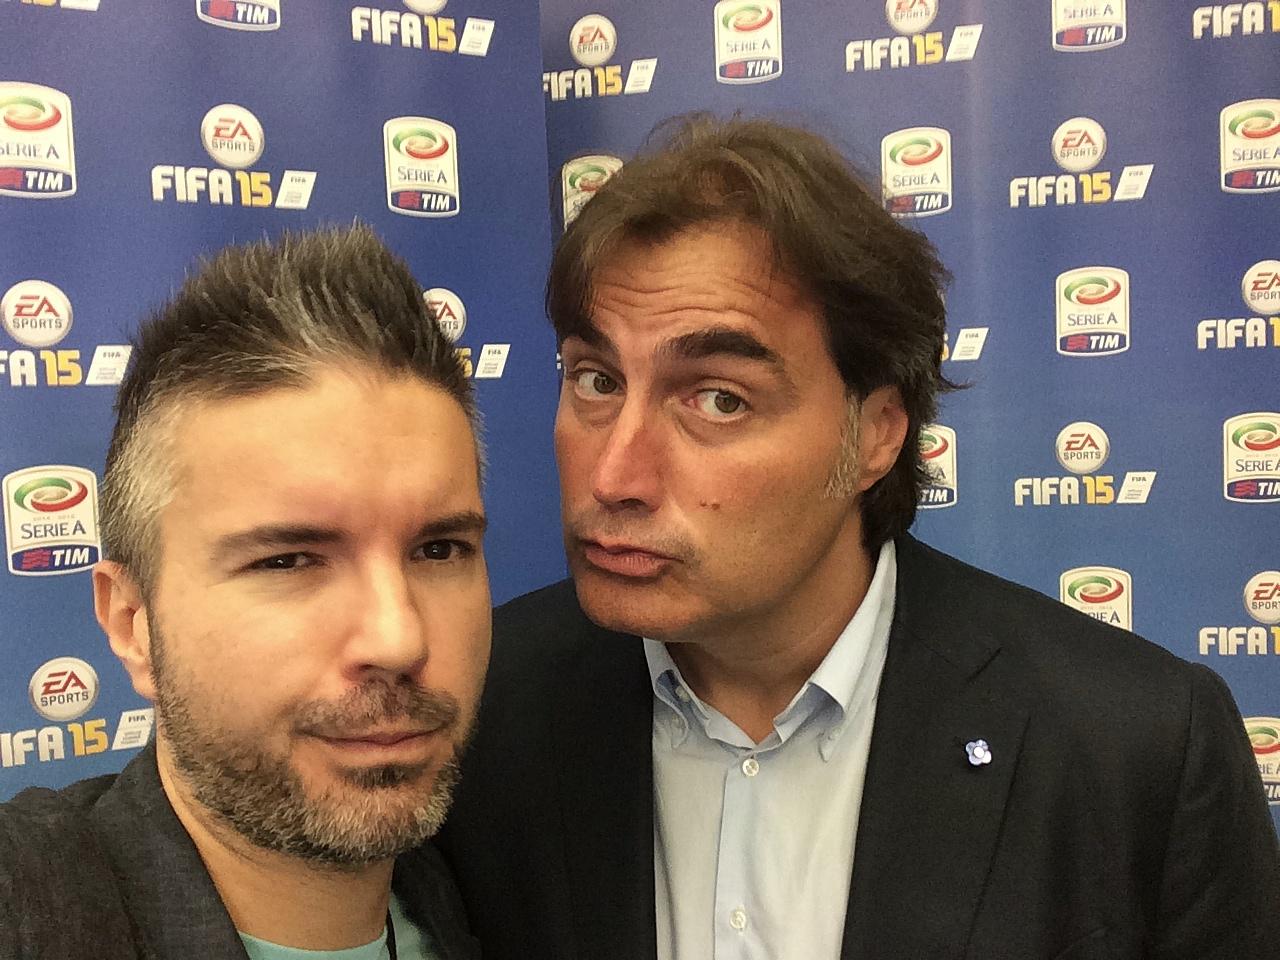 SelfiePardo